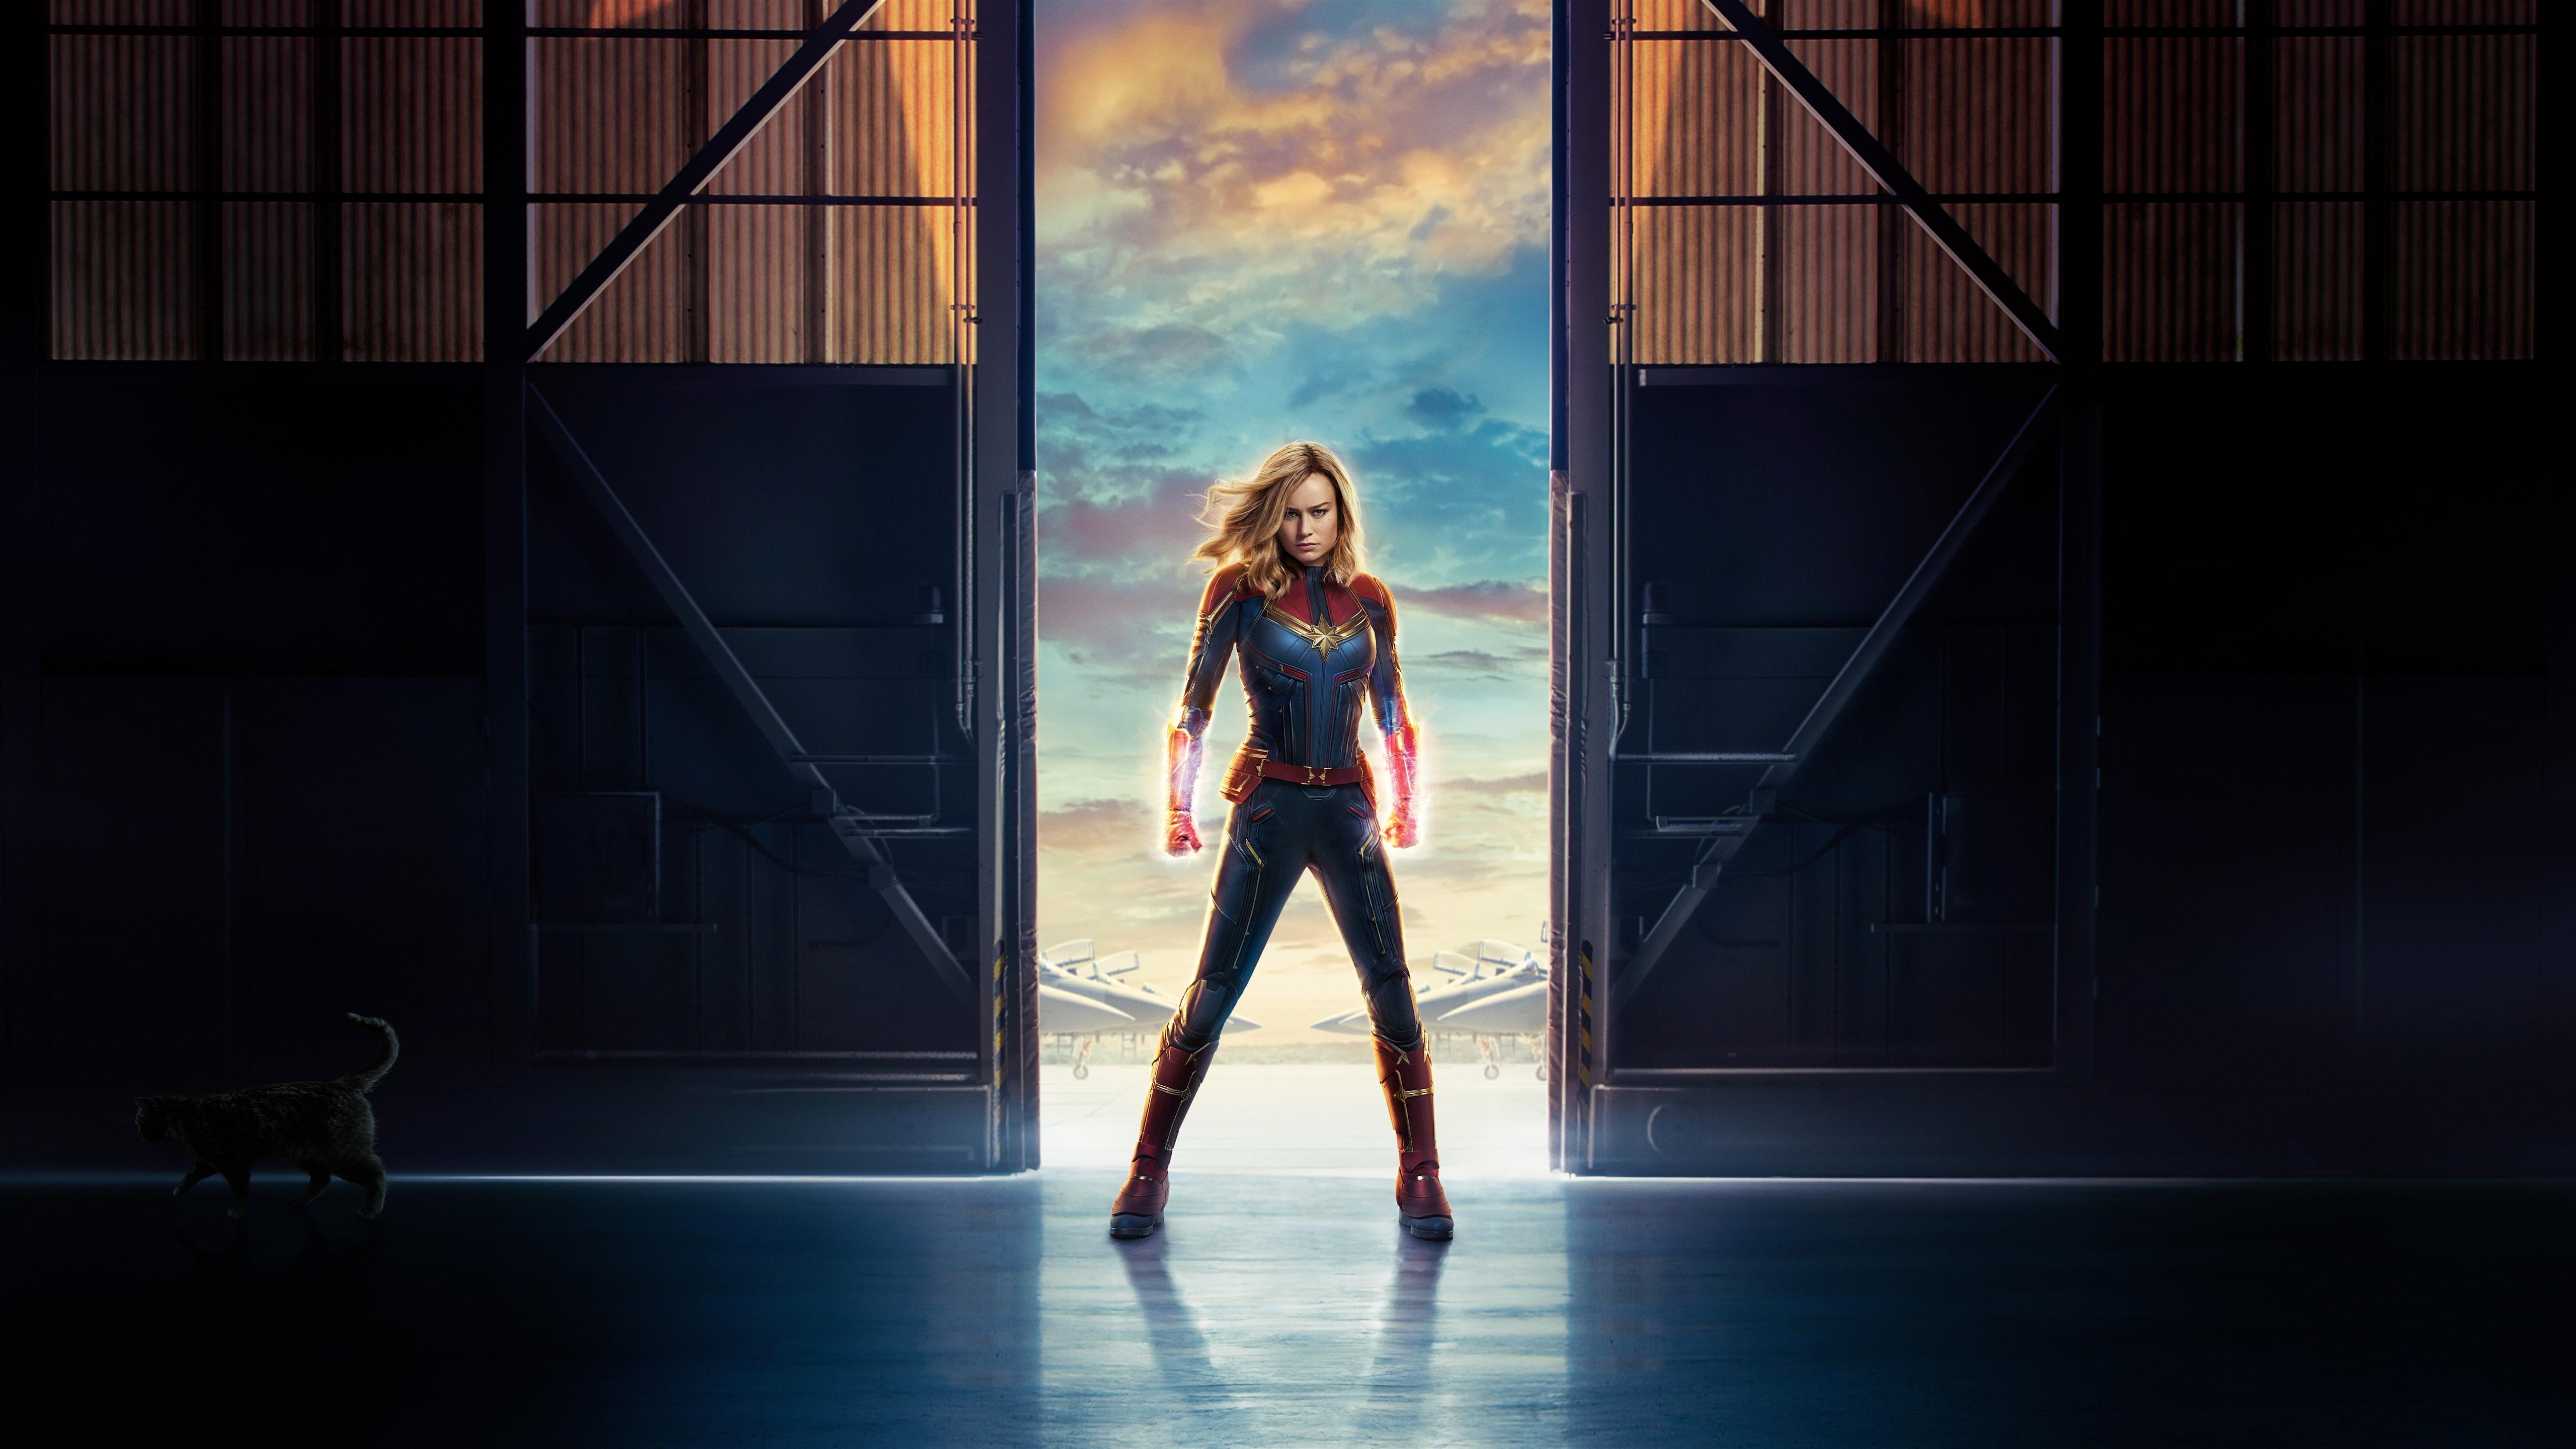 Movie Poster 2019: Captain Marvel, Brie Larson, Marvel Movie 2019 1242x2688